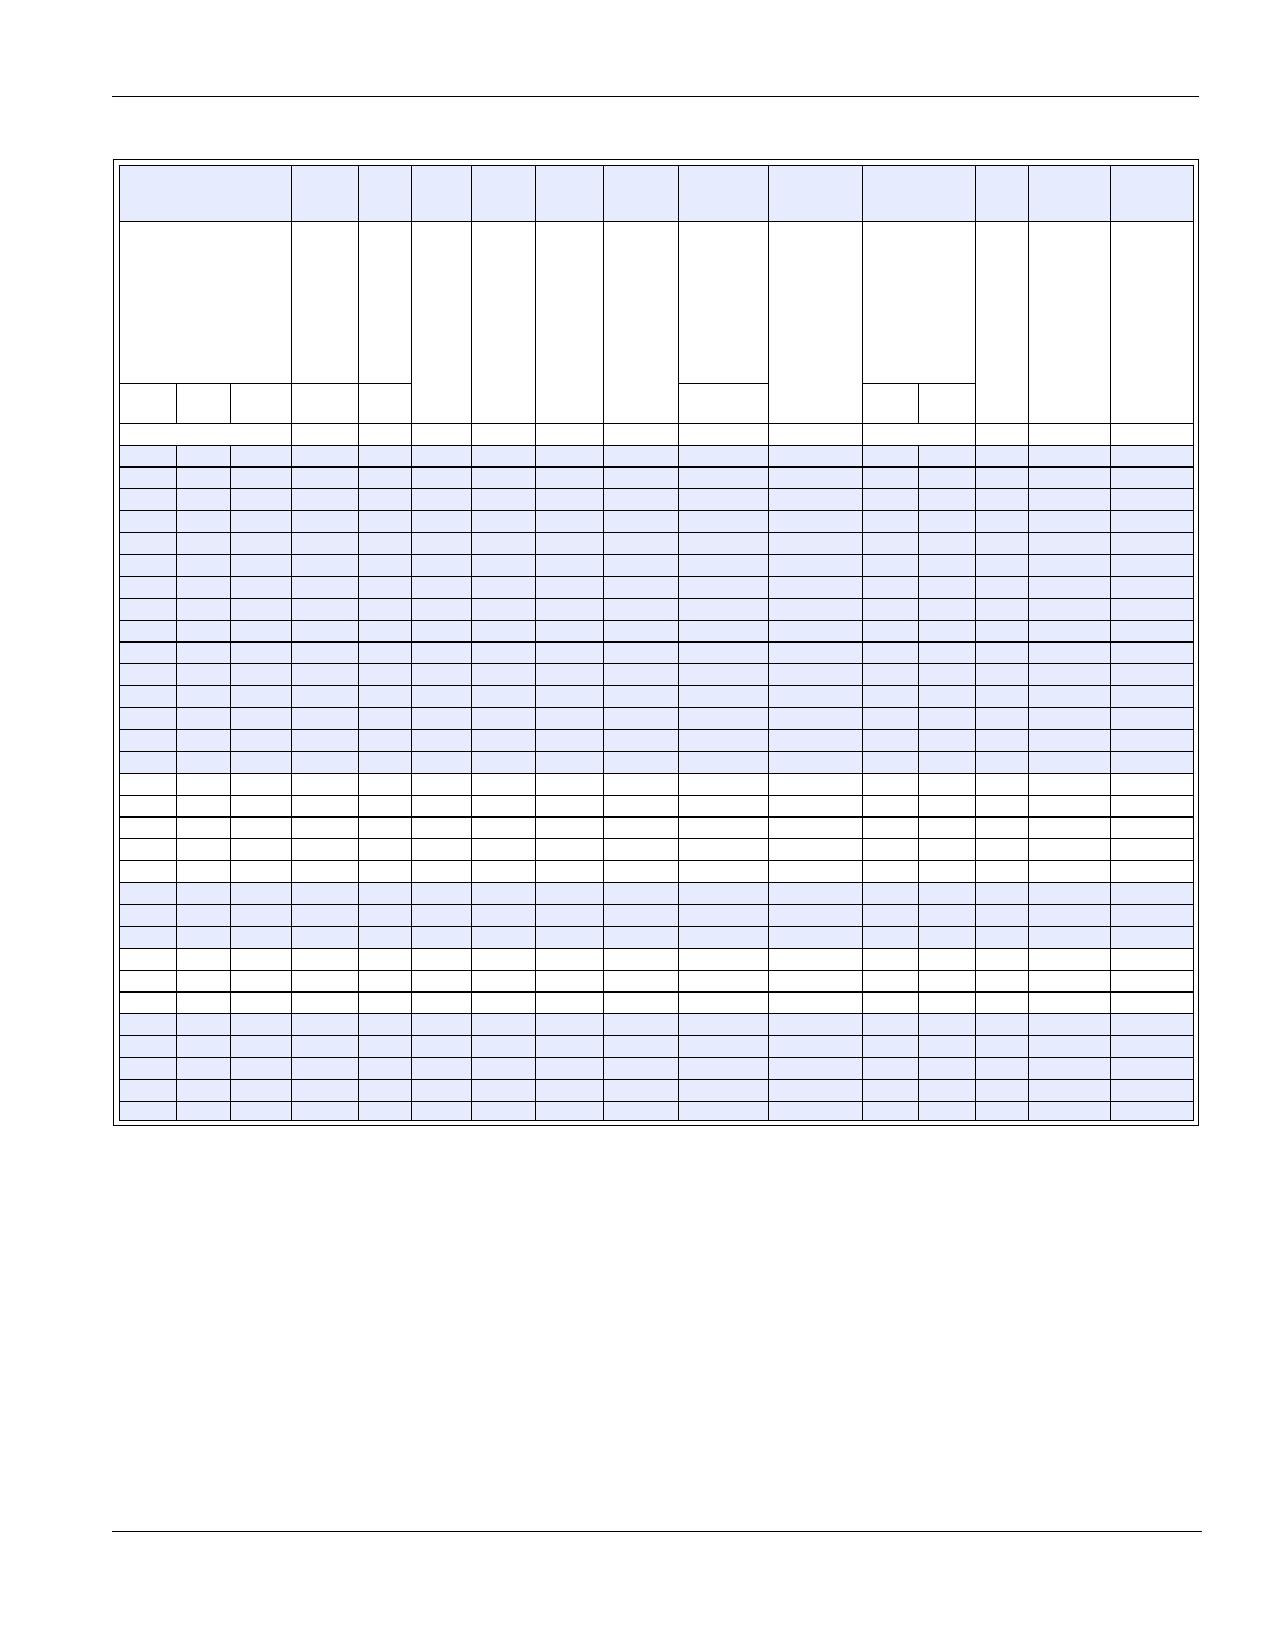 Q2008LH4 pdf